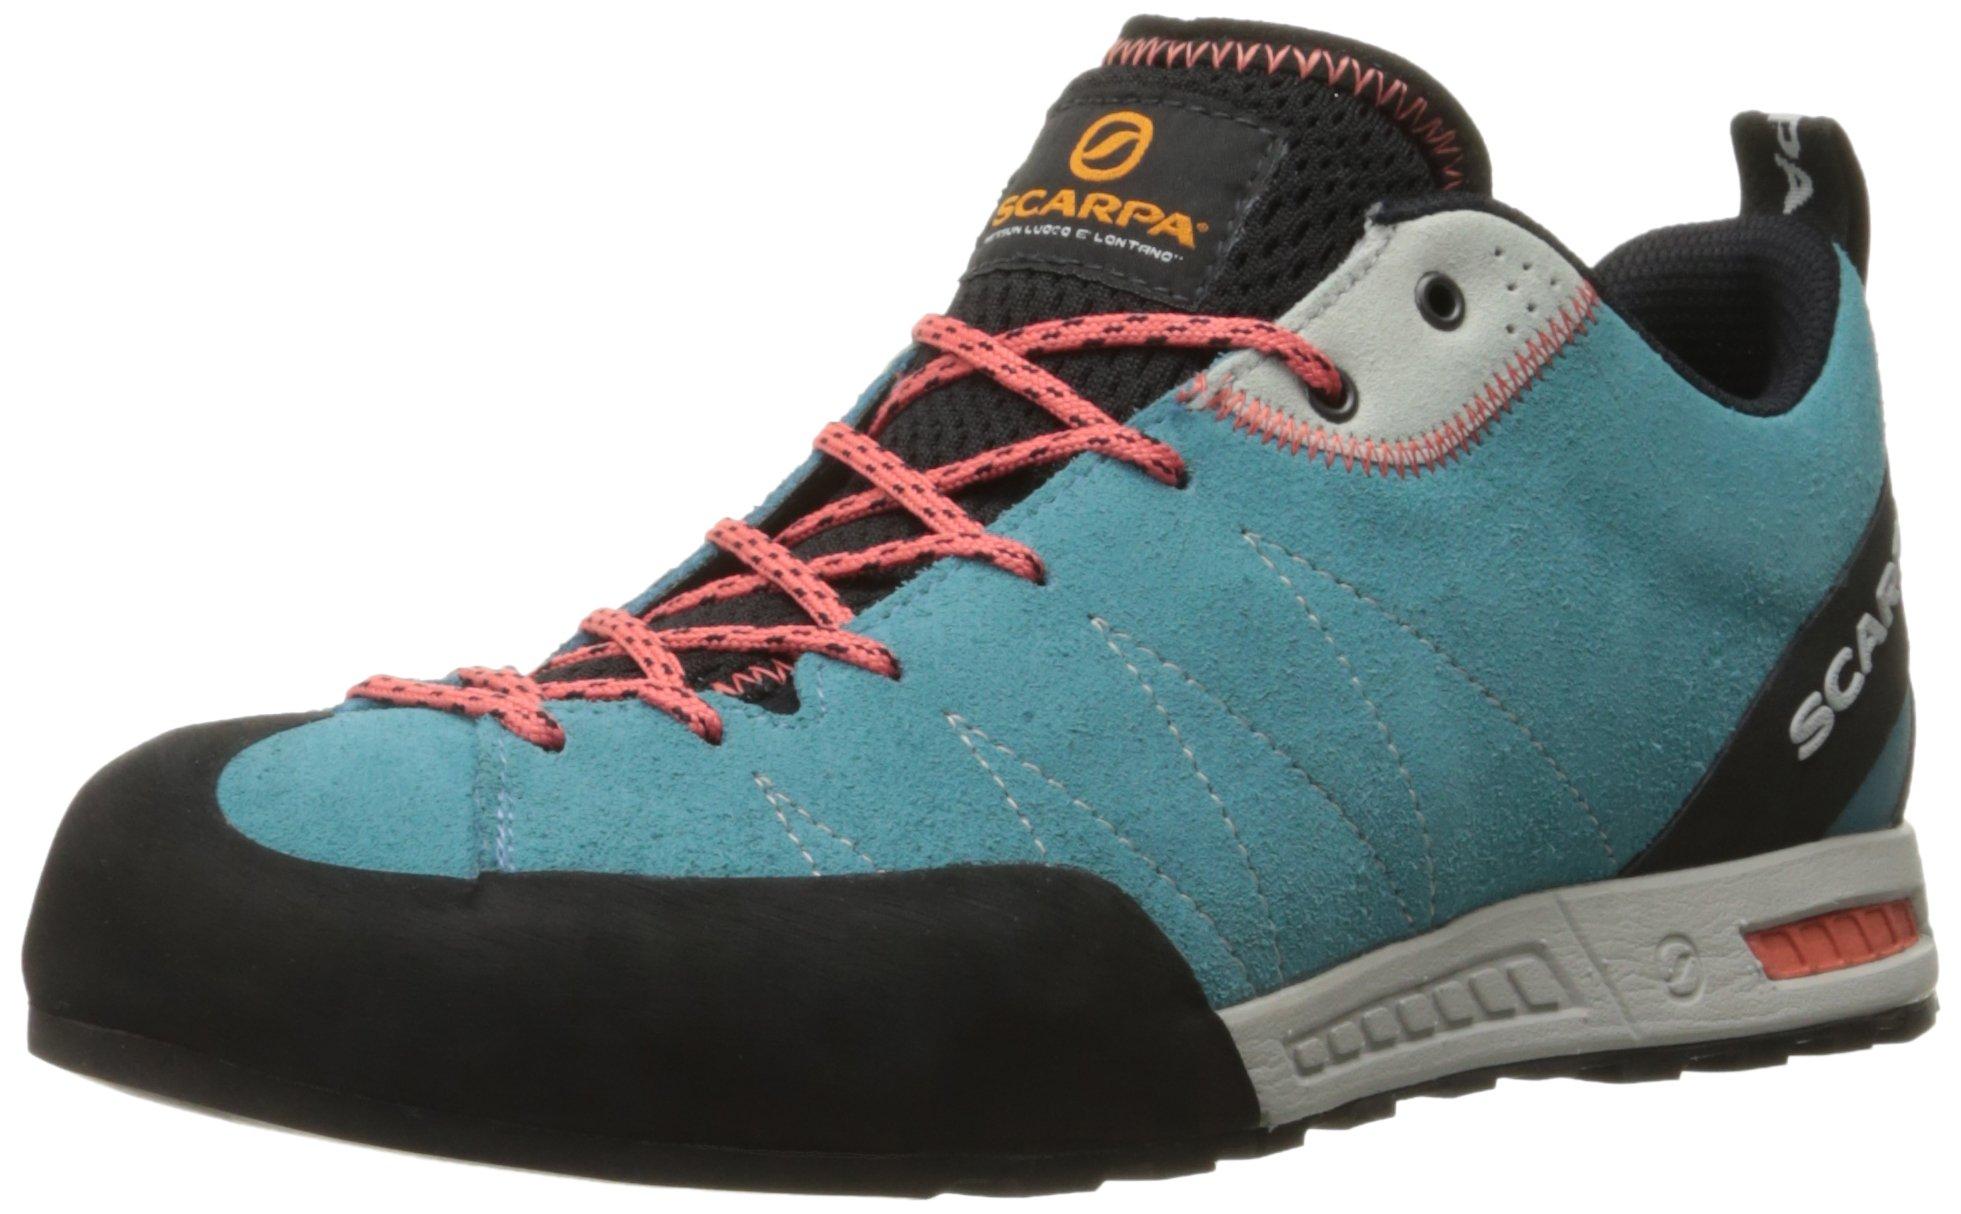 SCARPA Women's Gecko Wmn Approach Shoe, Ice Fall Brown/Coral Red, 37 EU/6 M US